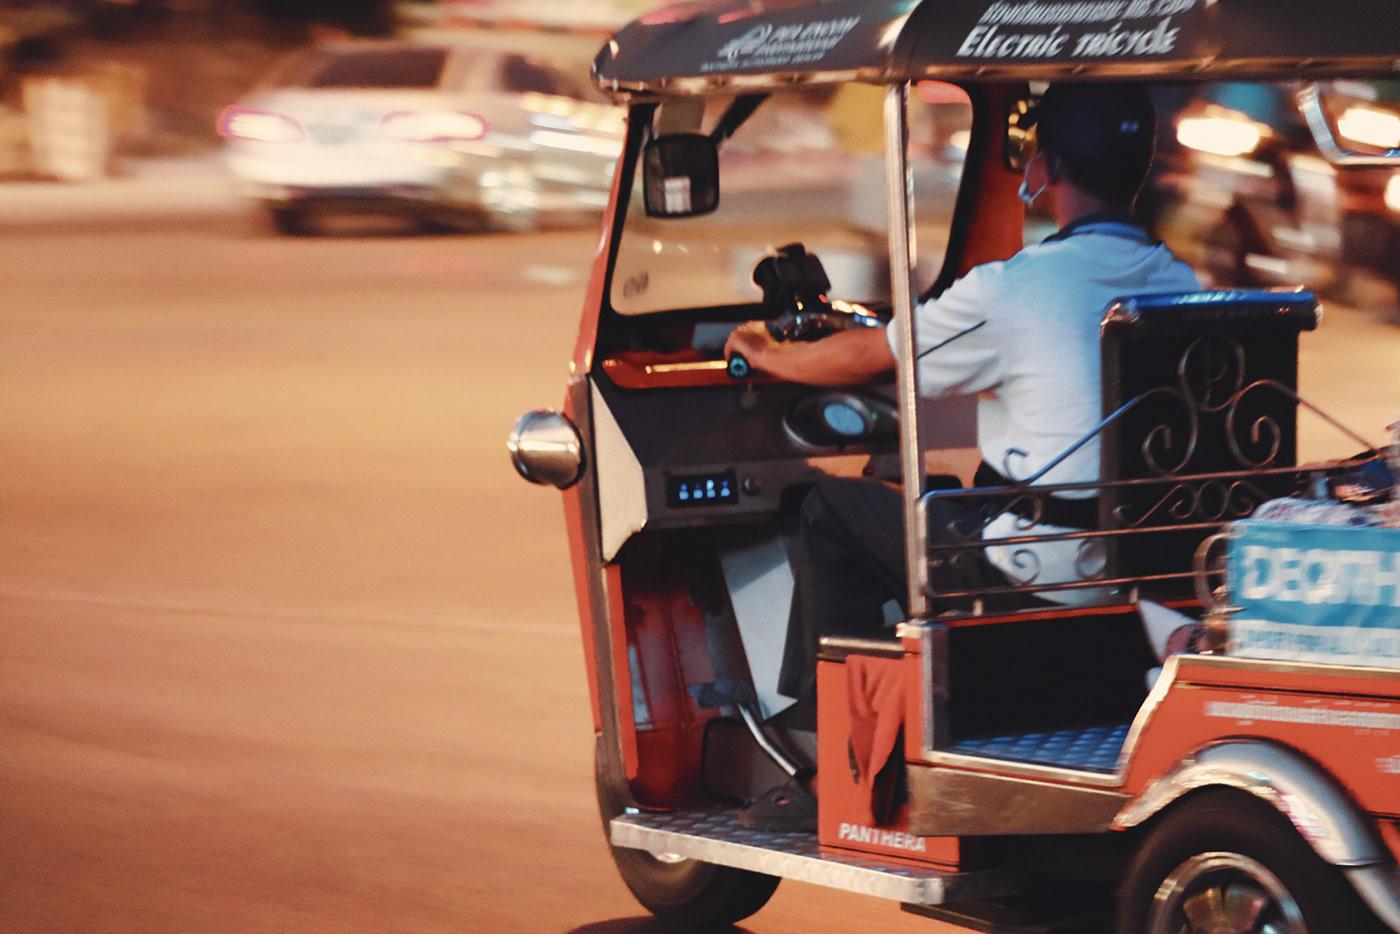 Adobe Photoshop aiga Canon festival iPad journey photo sights Thailand Awarded BEHANCE